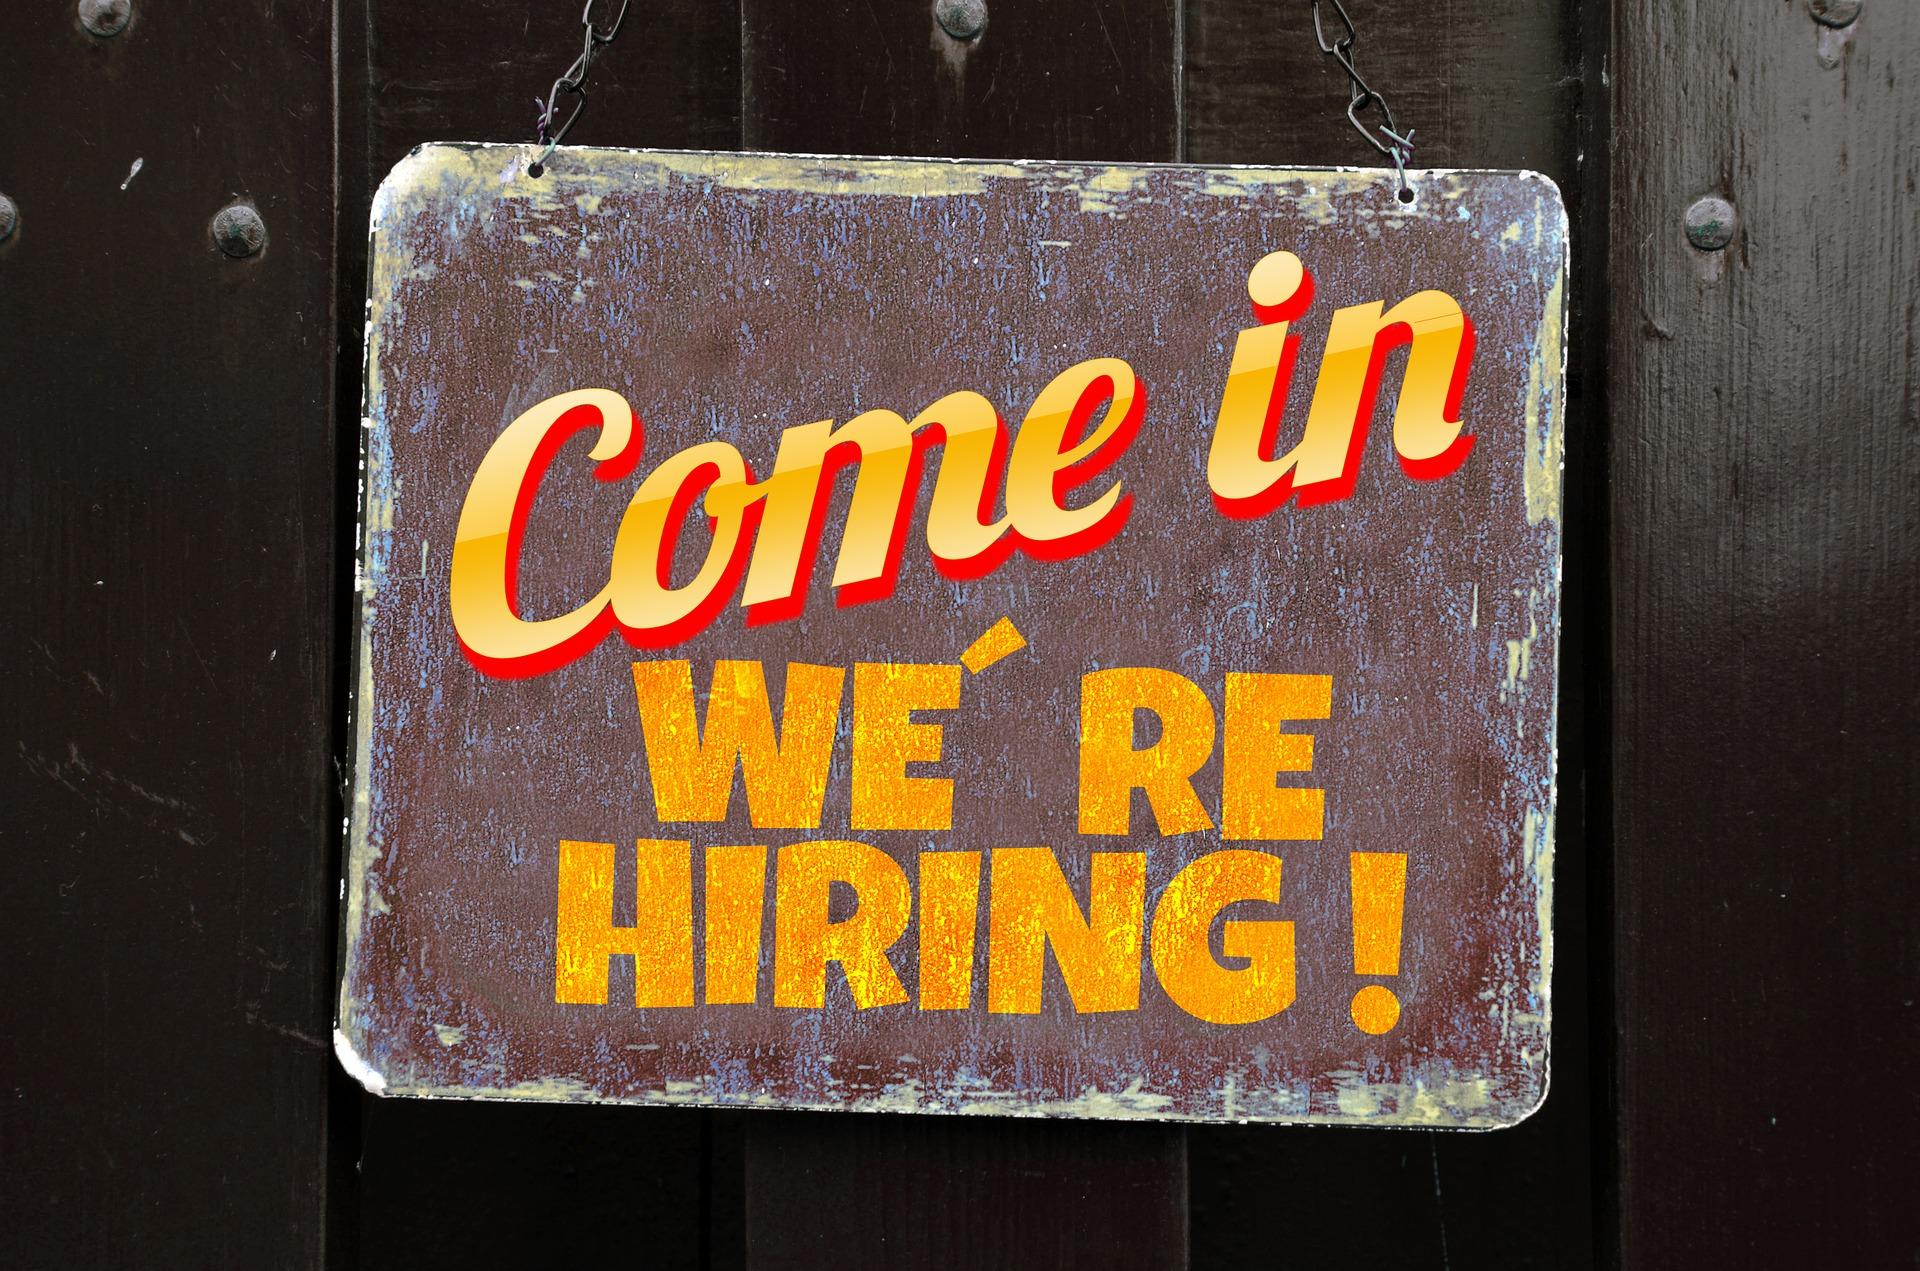 Employment opportunities in rock hill, sc